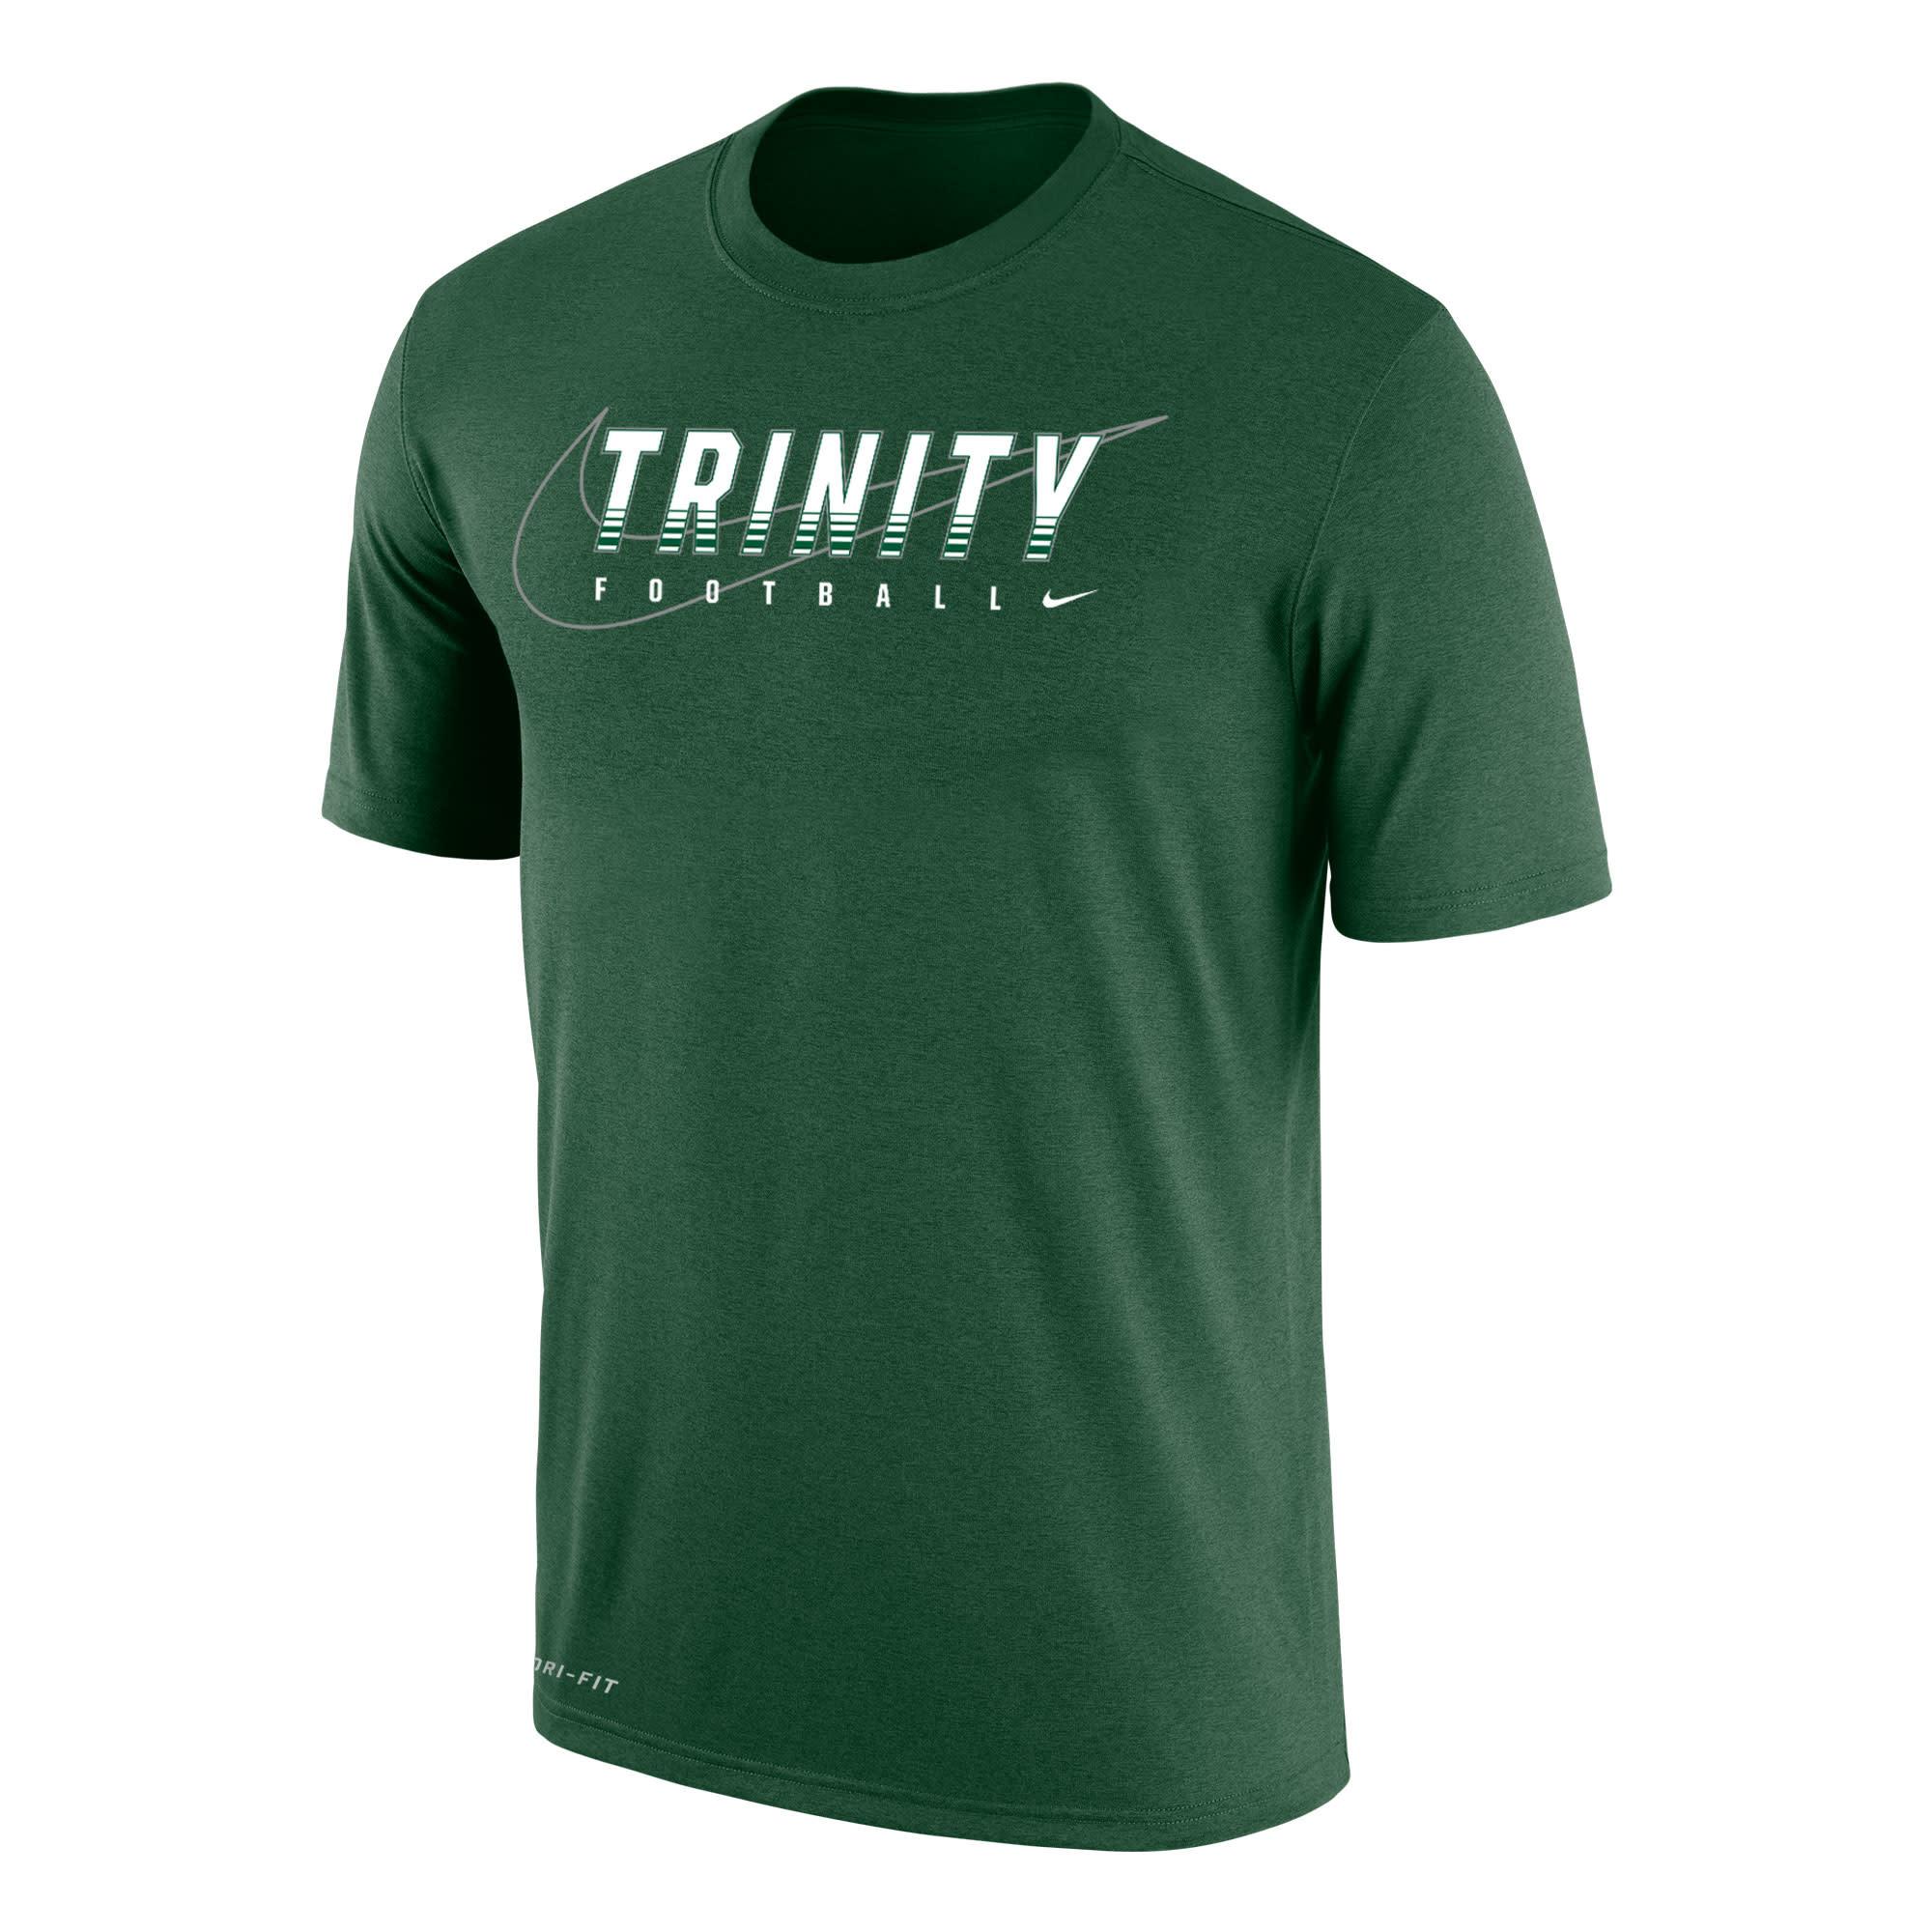 Nike Nike Football Drifit Cotton Green Football